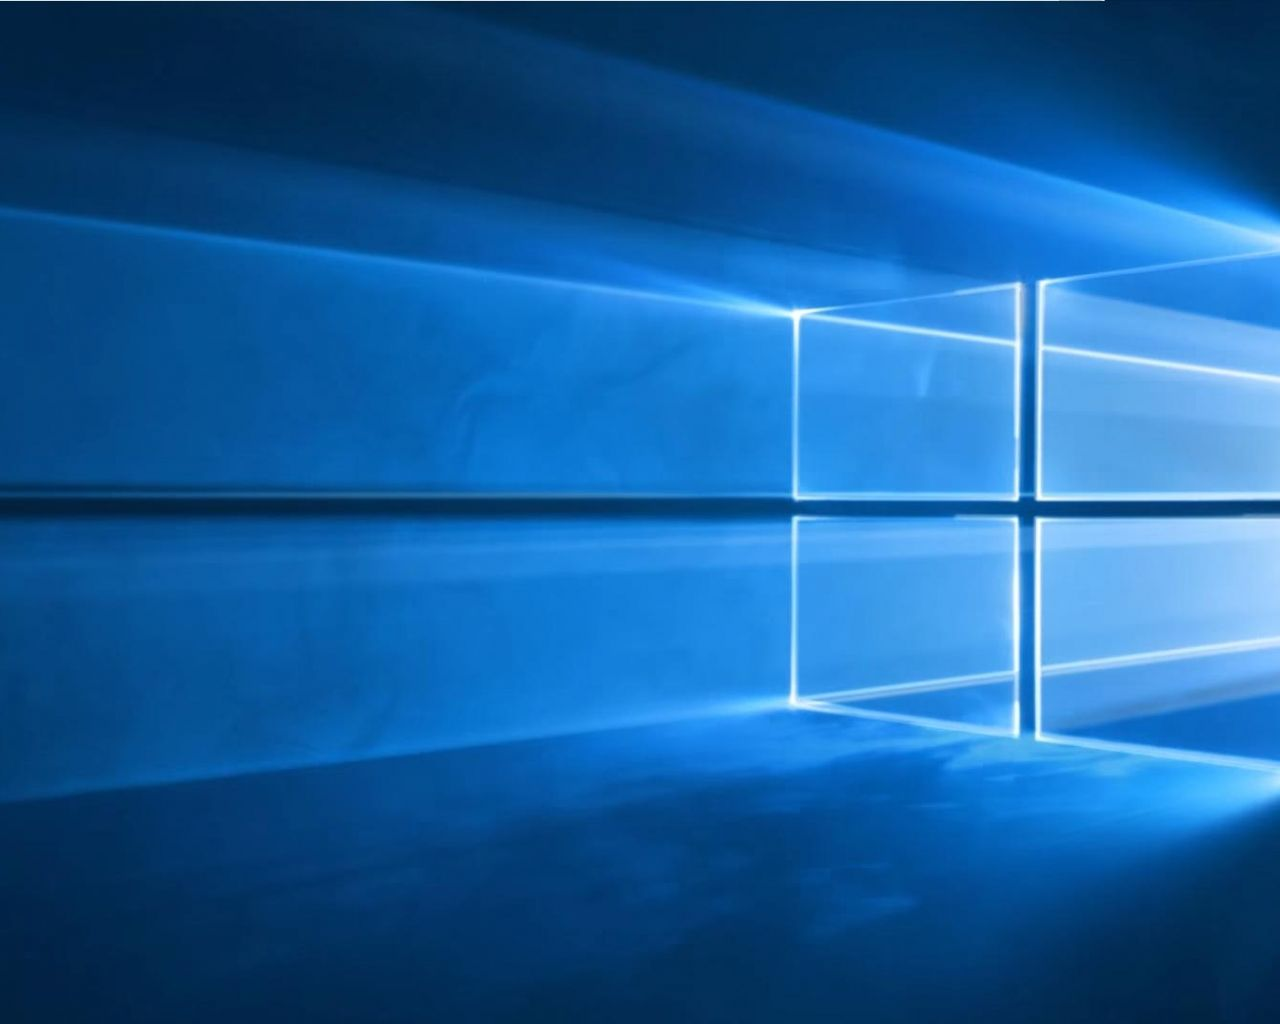 Windows Default Wallpapers On Wallpaperdog